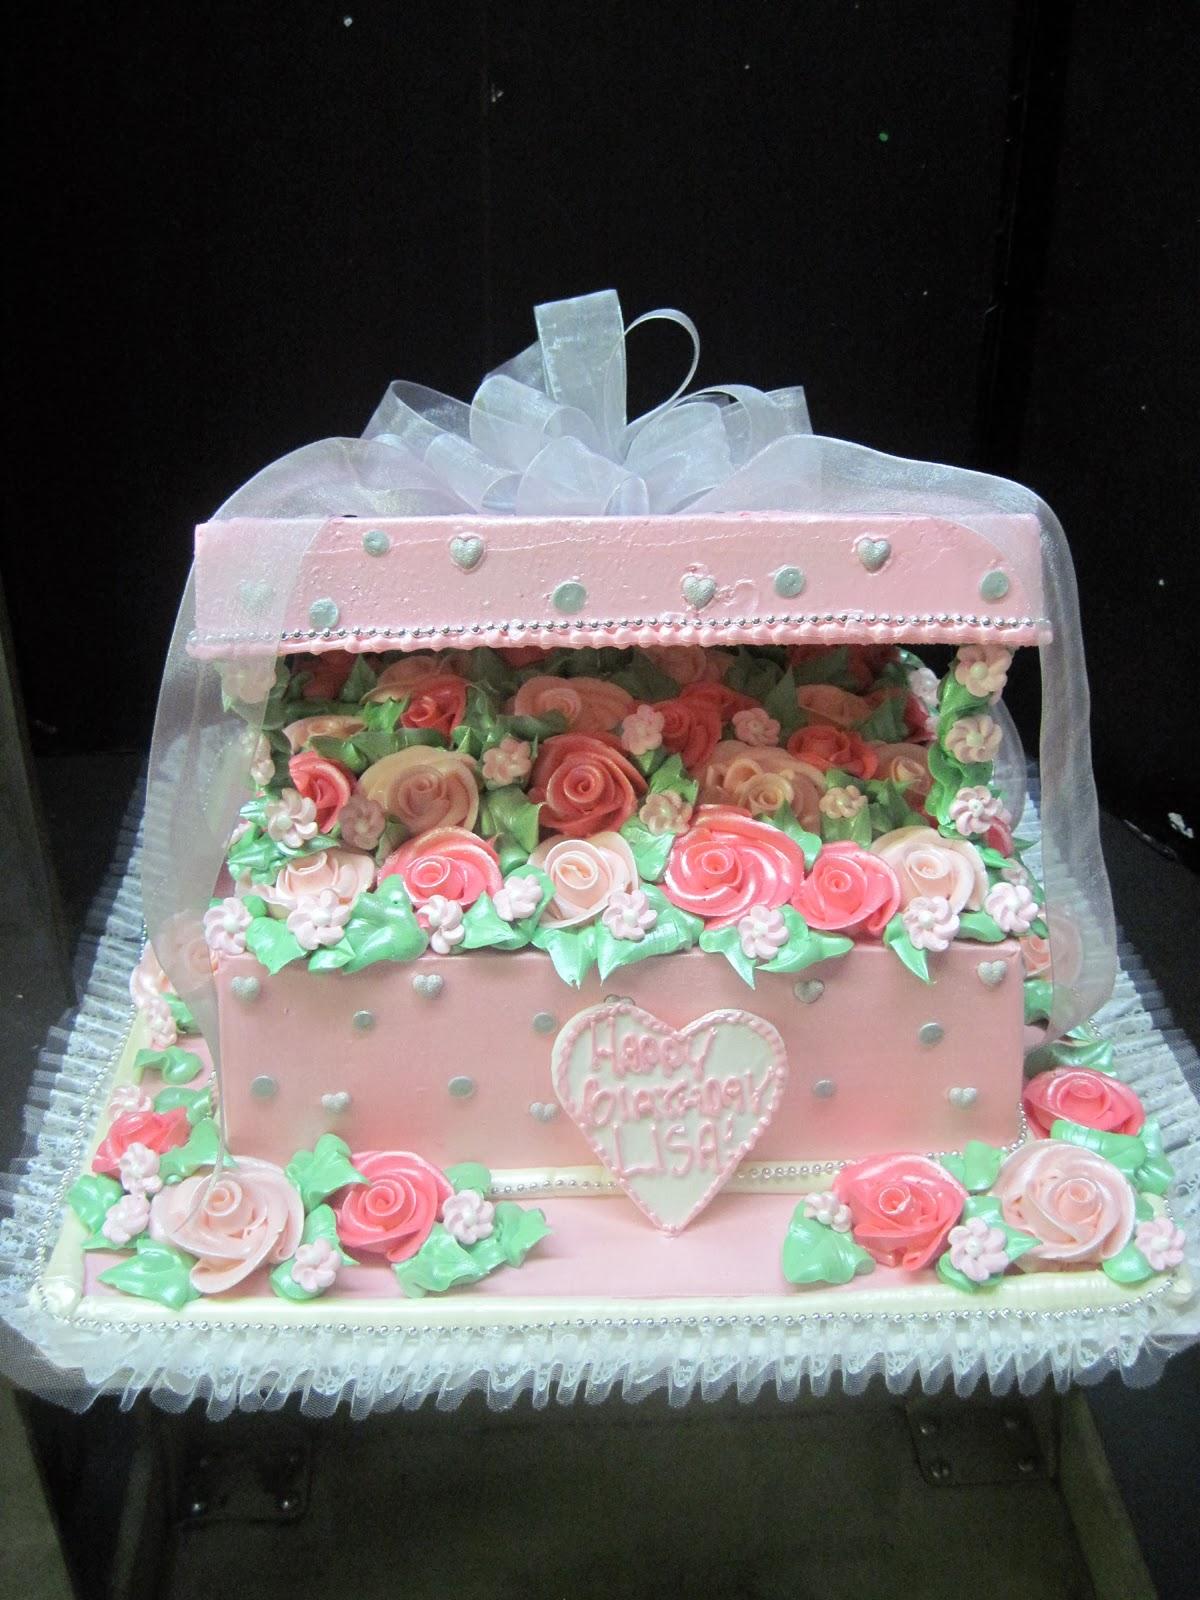 Hansen S Cakes Celebrating With Cake